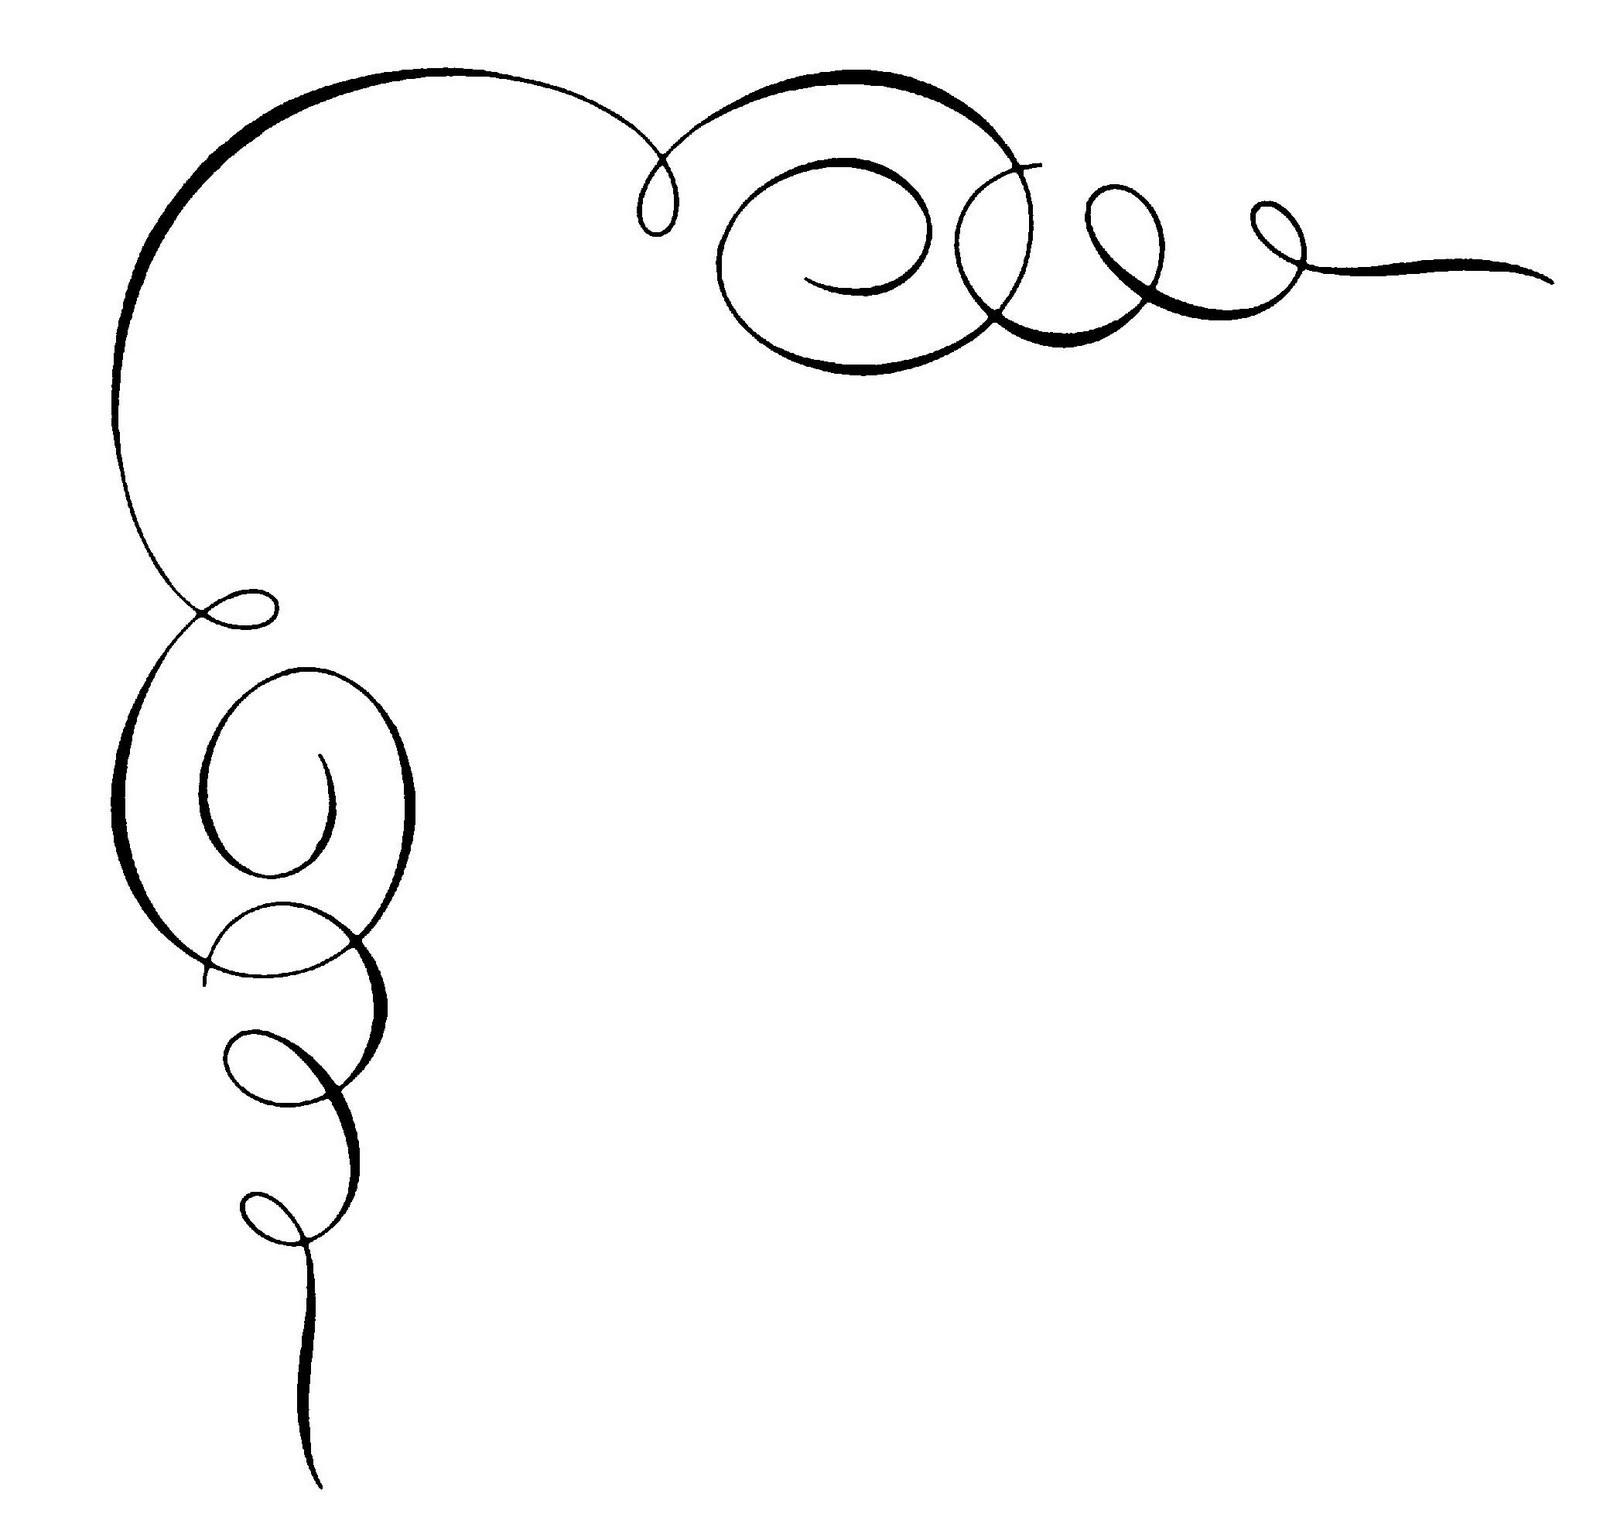 Ornamental Free Vector Art  7171 Free Downloads  Vecteezy